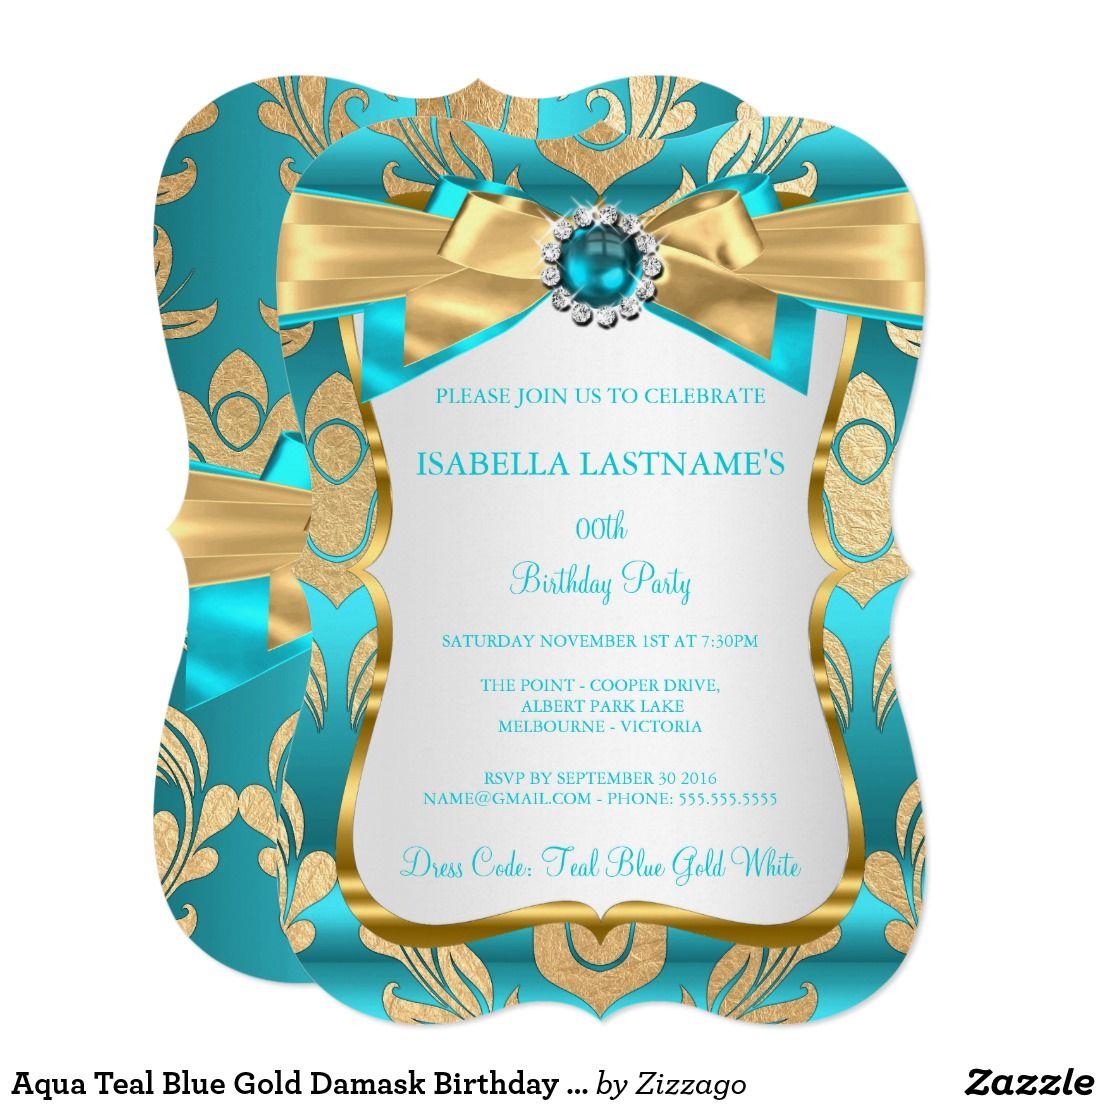 Aqua Teal Blue Gold Damask Birthday Party Invite | Birthdays and ...